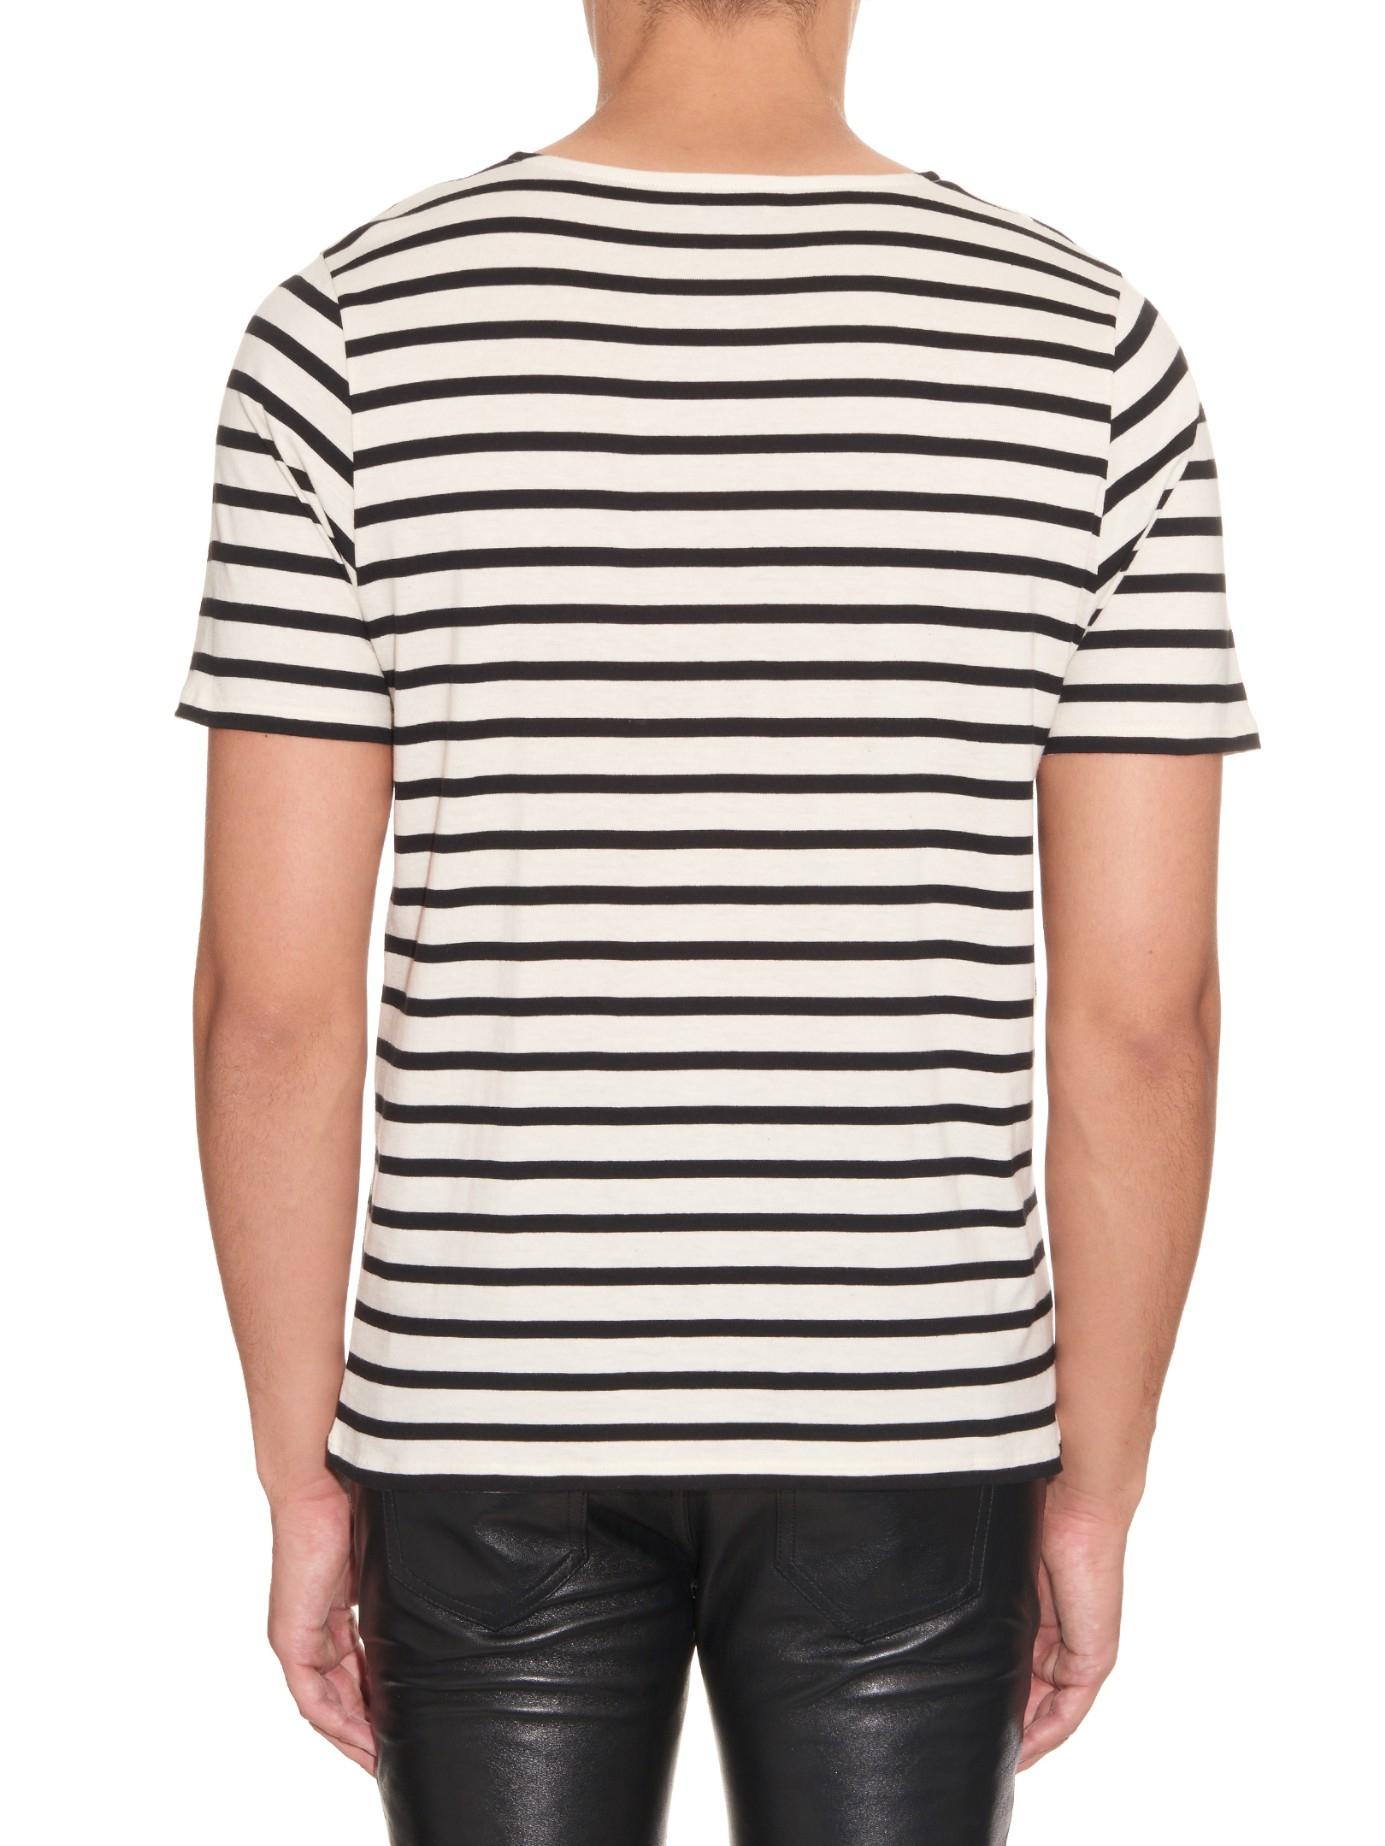 Striped cotton-jersey T-shirt Saint Laurent Prices For Sale Sale Countdown Package Outlet Explore Choice 24dYI